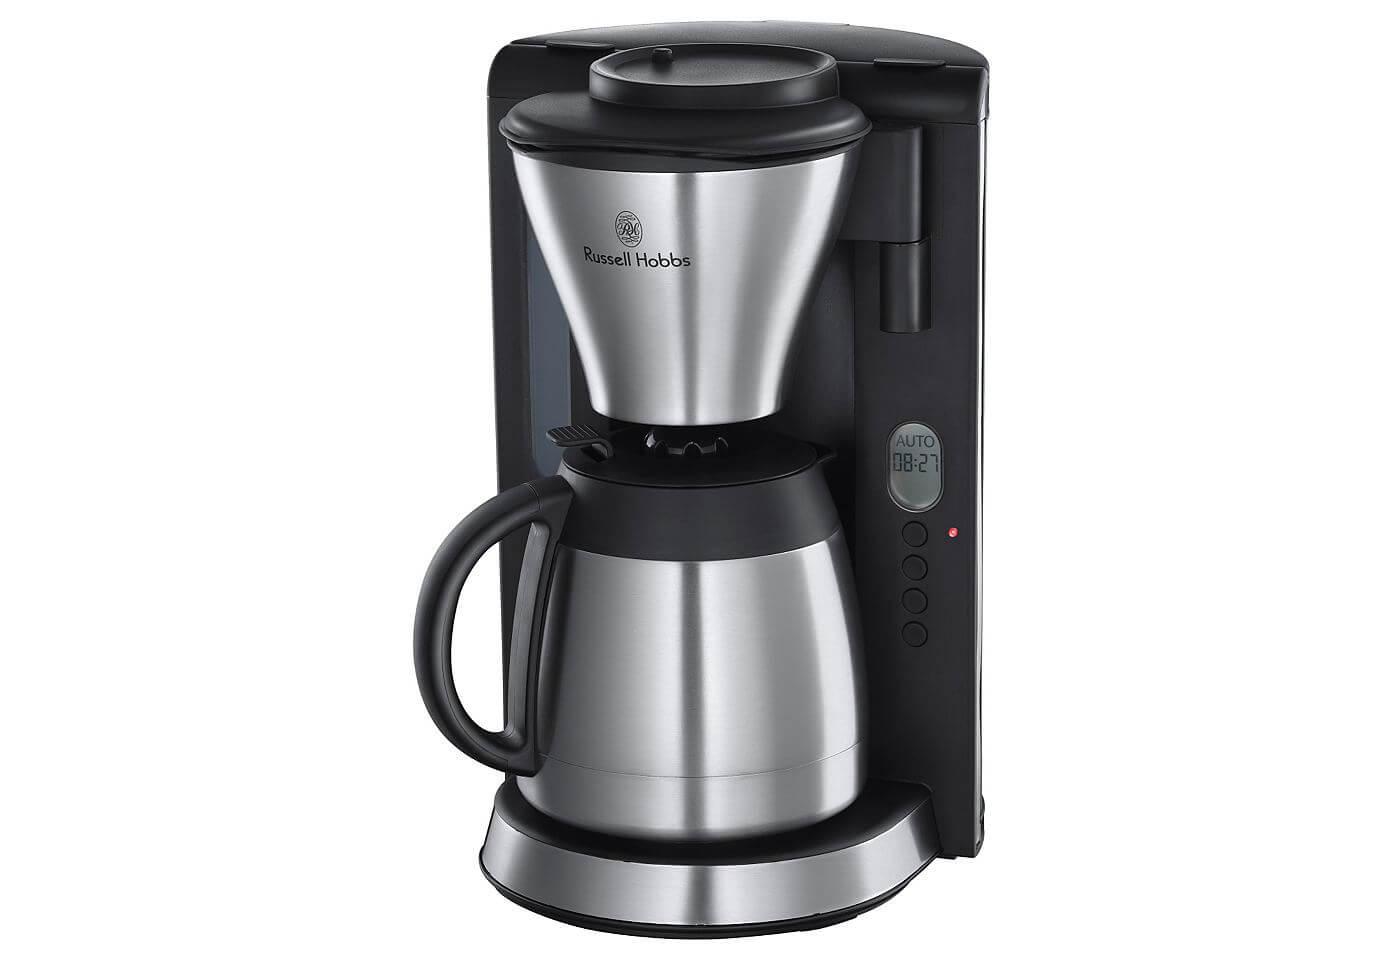 Russell Hobbs Kaffeemaschine »Fast Brew« 18374-56